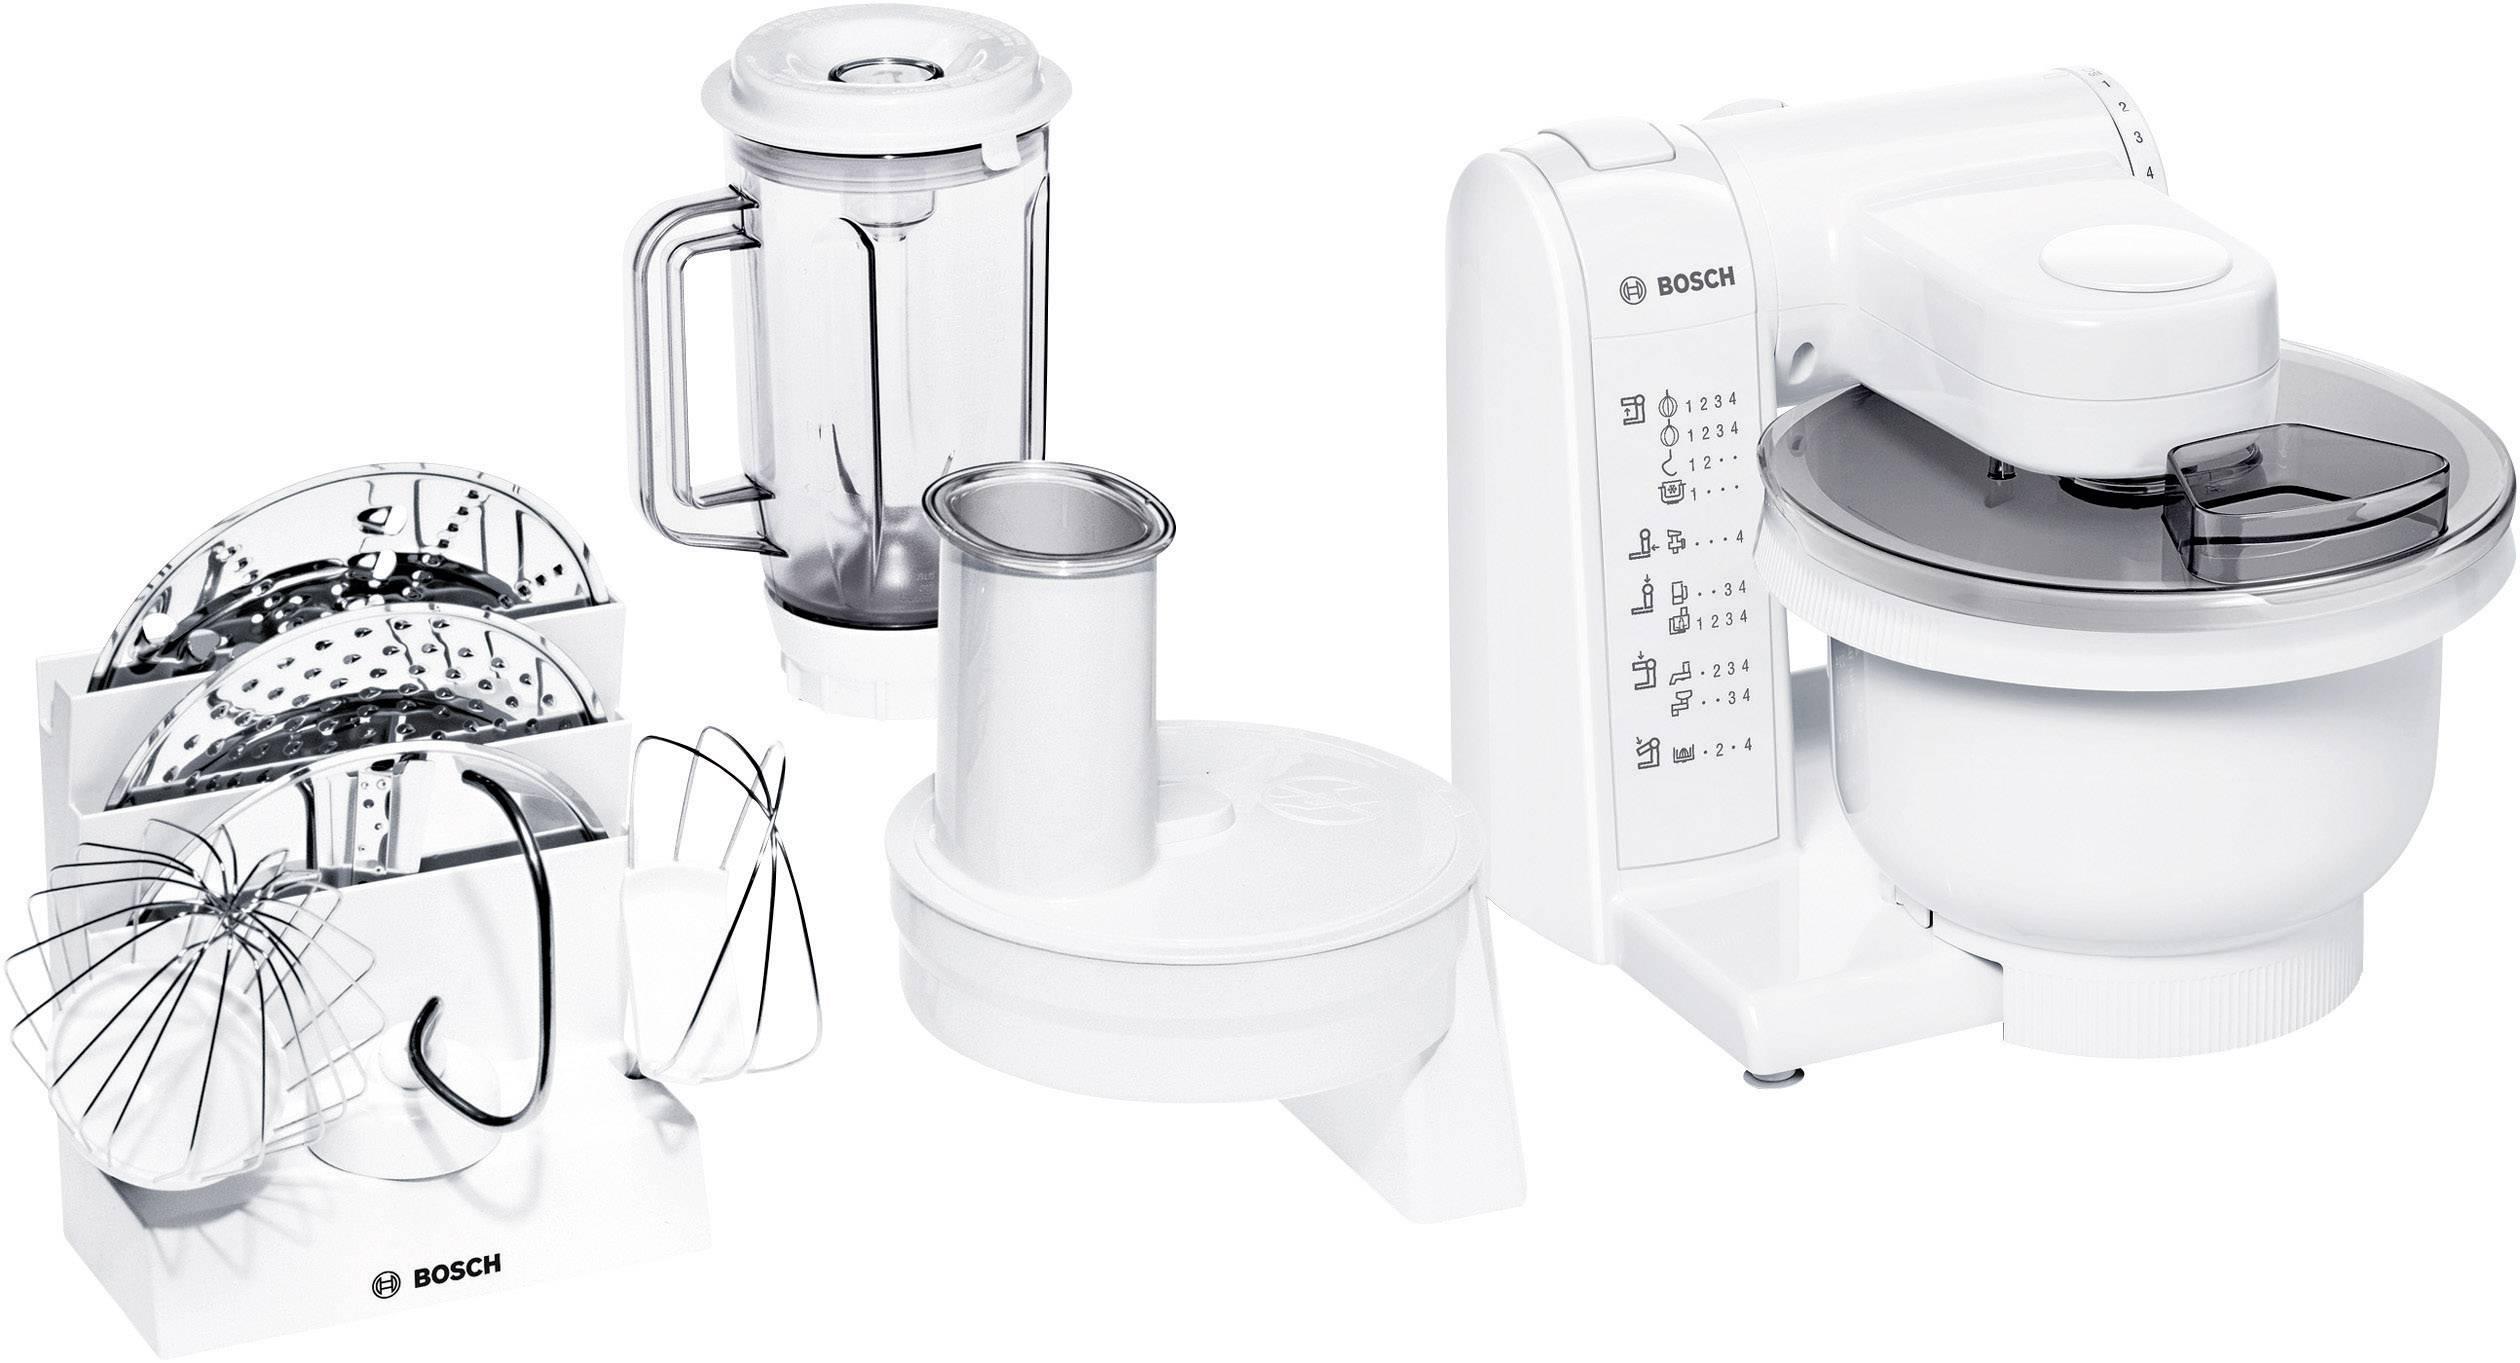 Bosch Haushalt MUM 4830 Robot da cucina 600 W Bianco | Conrad.it